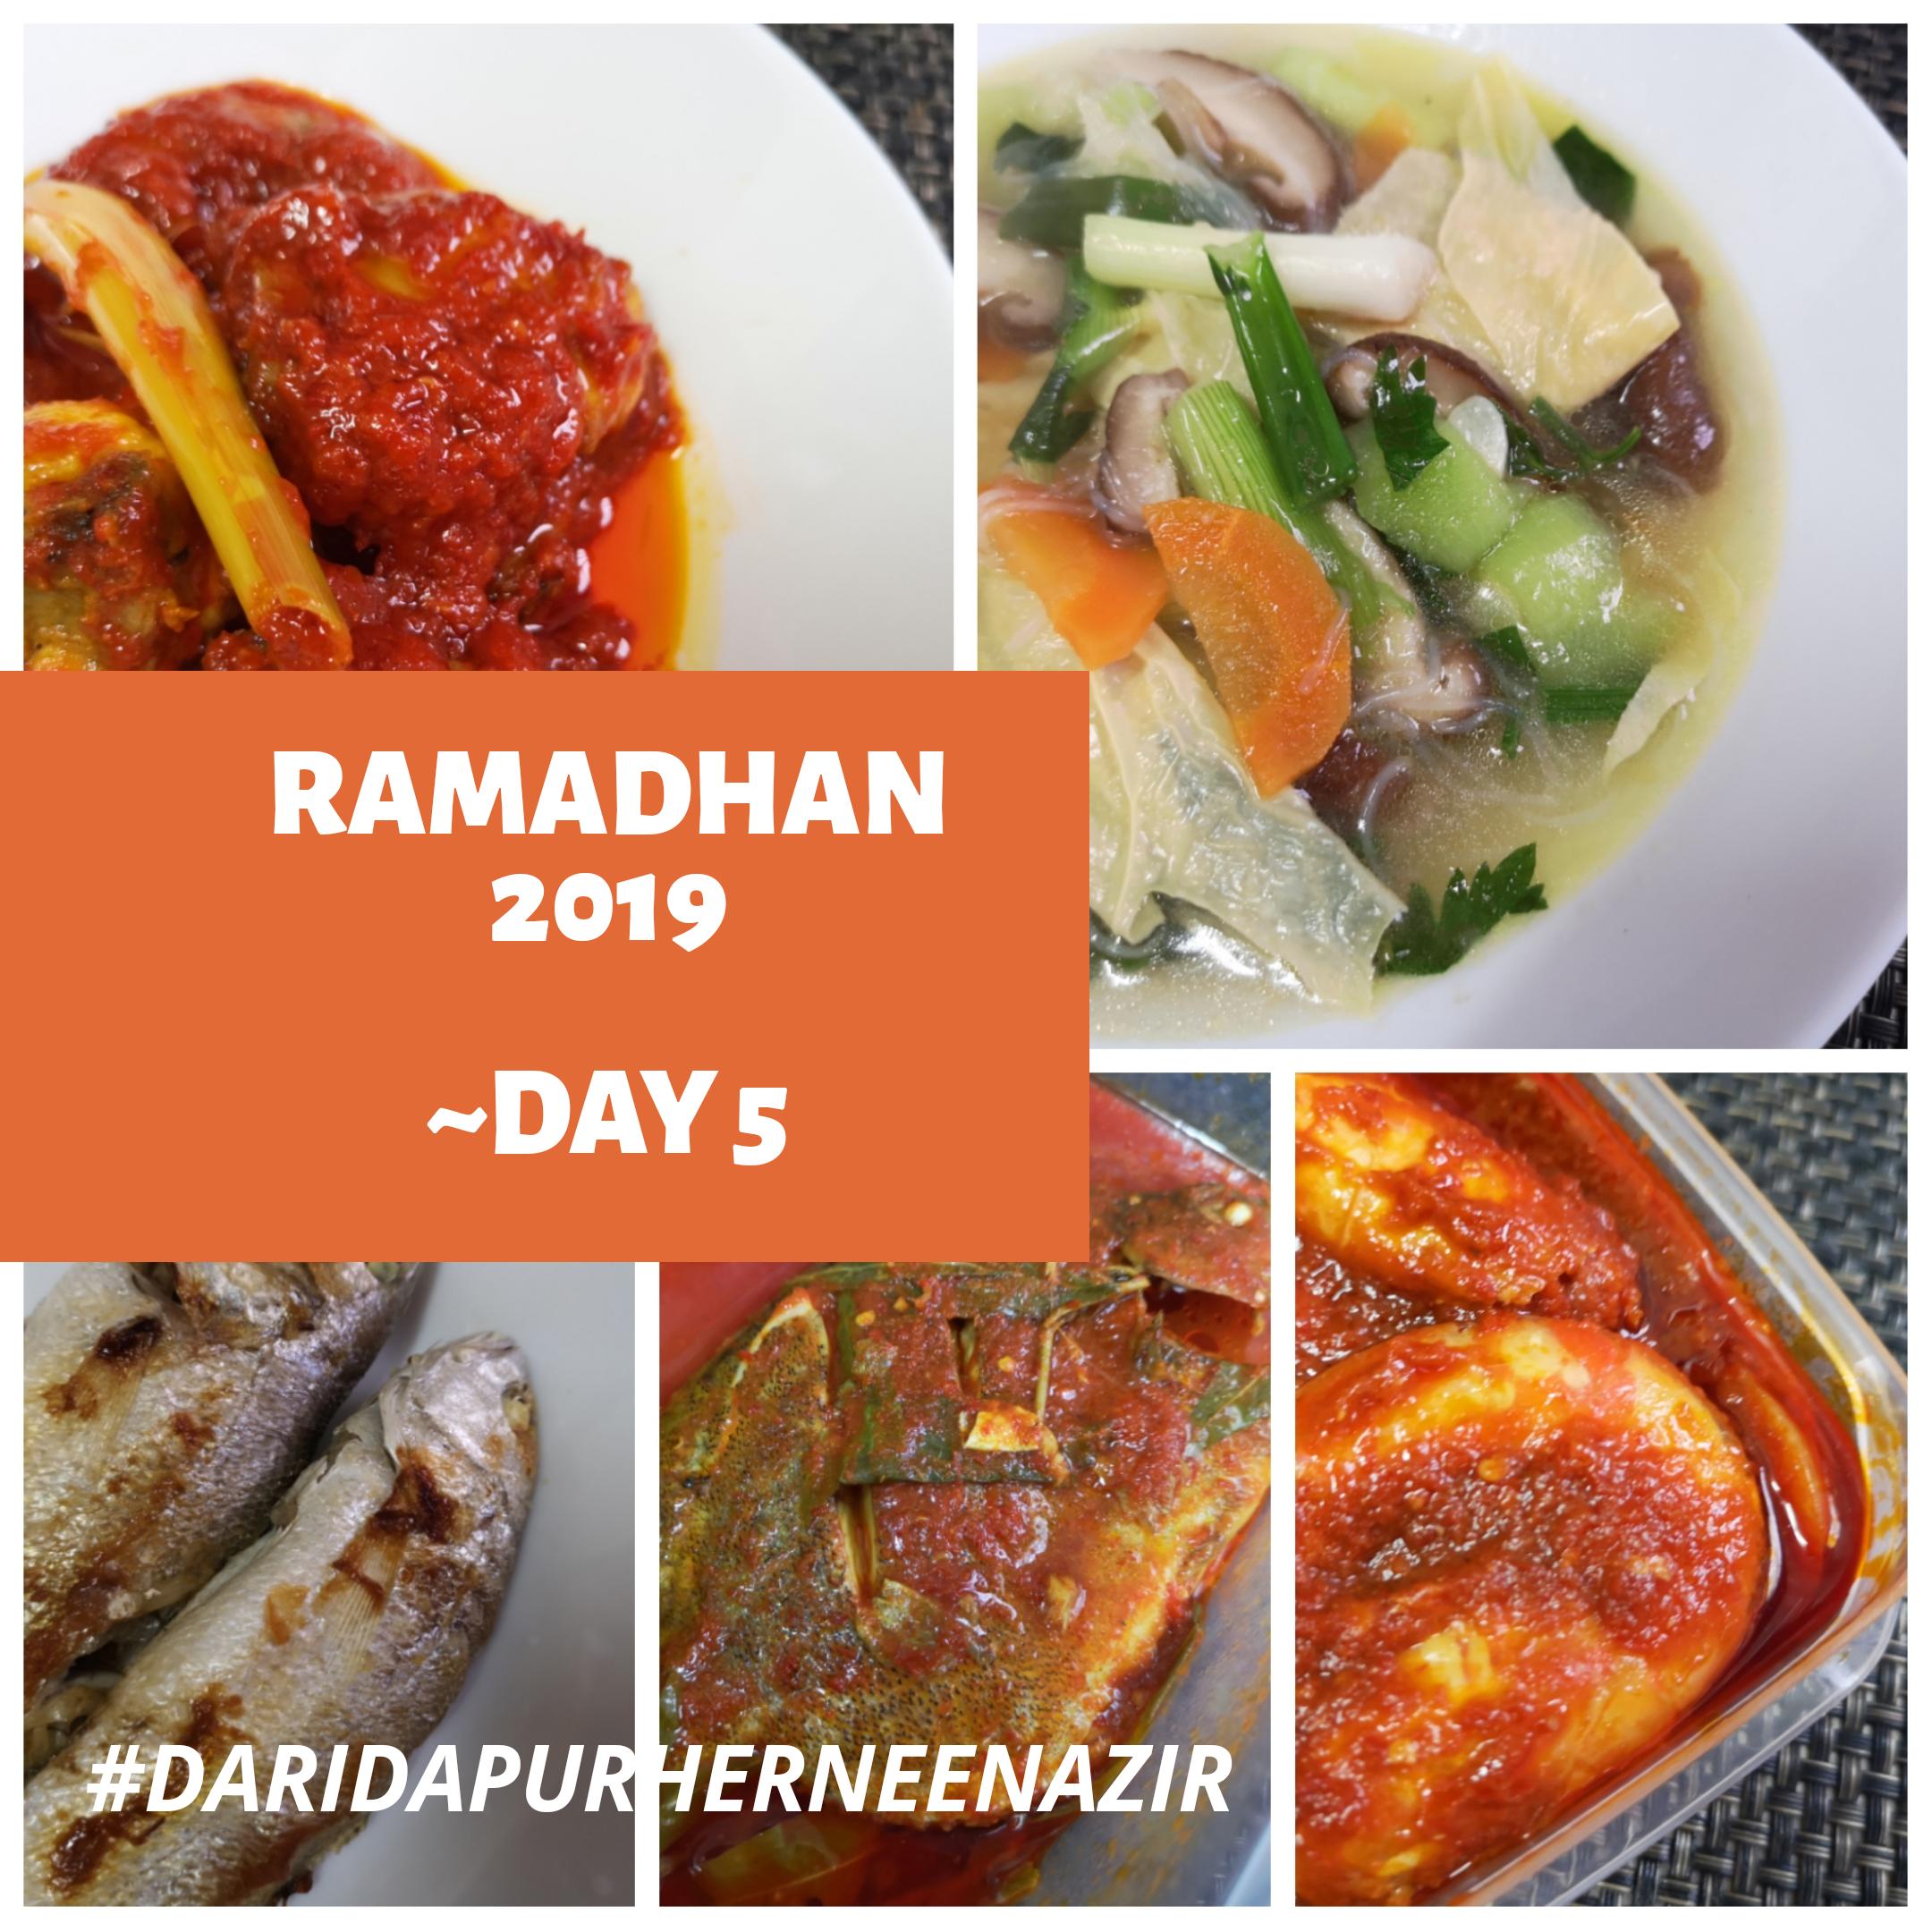 Ramadhan 2019 – Day 5